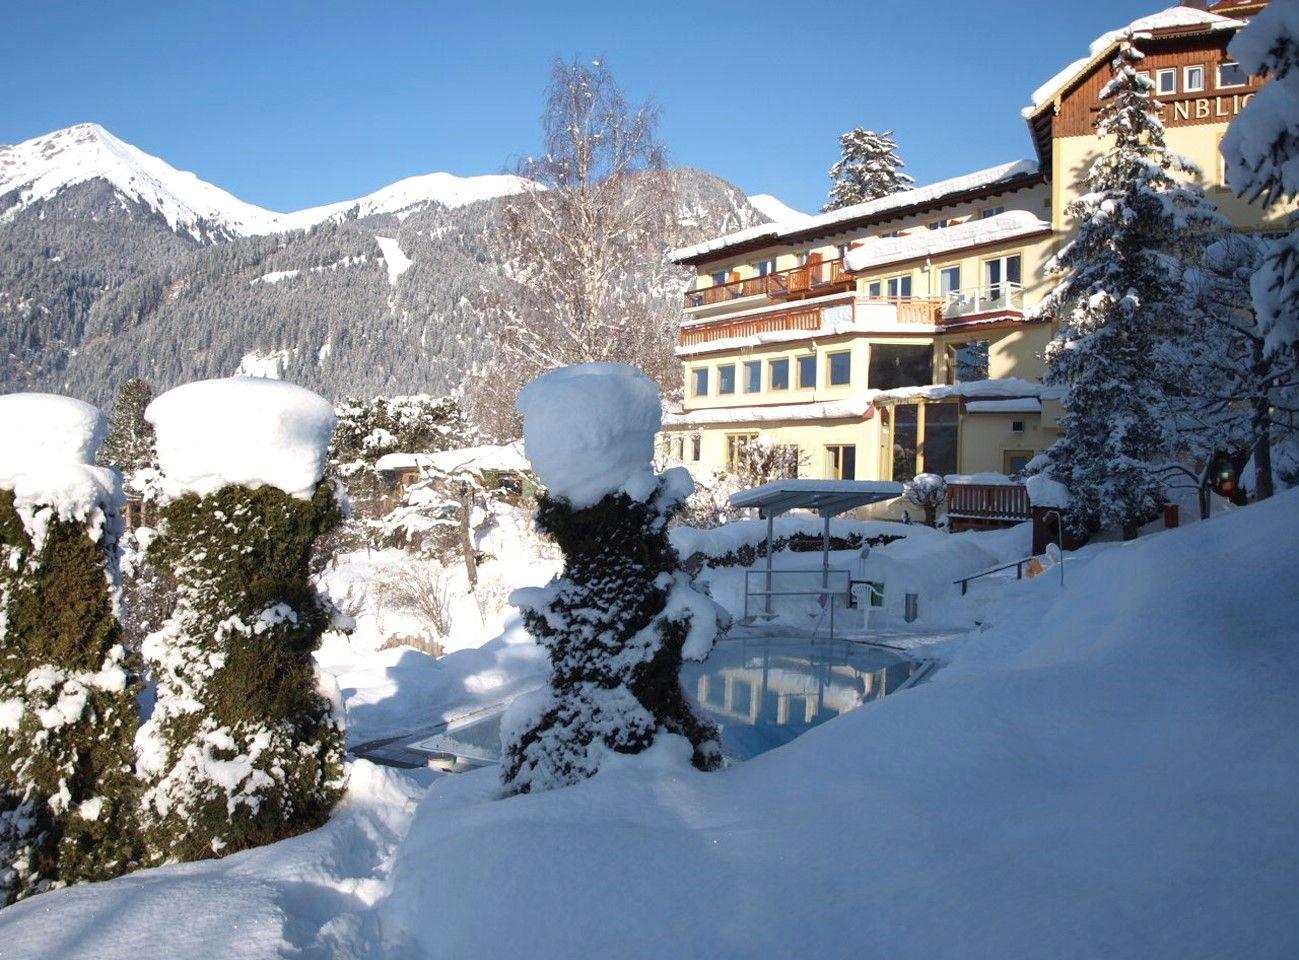 kur- und sporthotel alpenblick